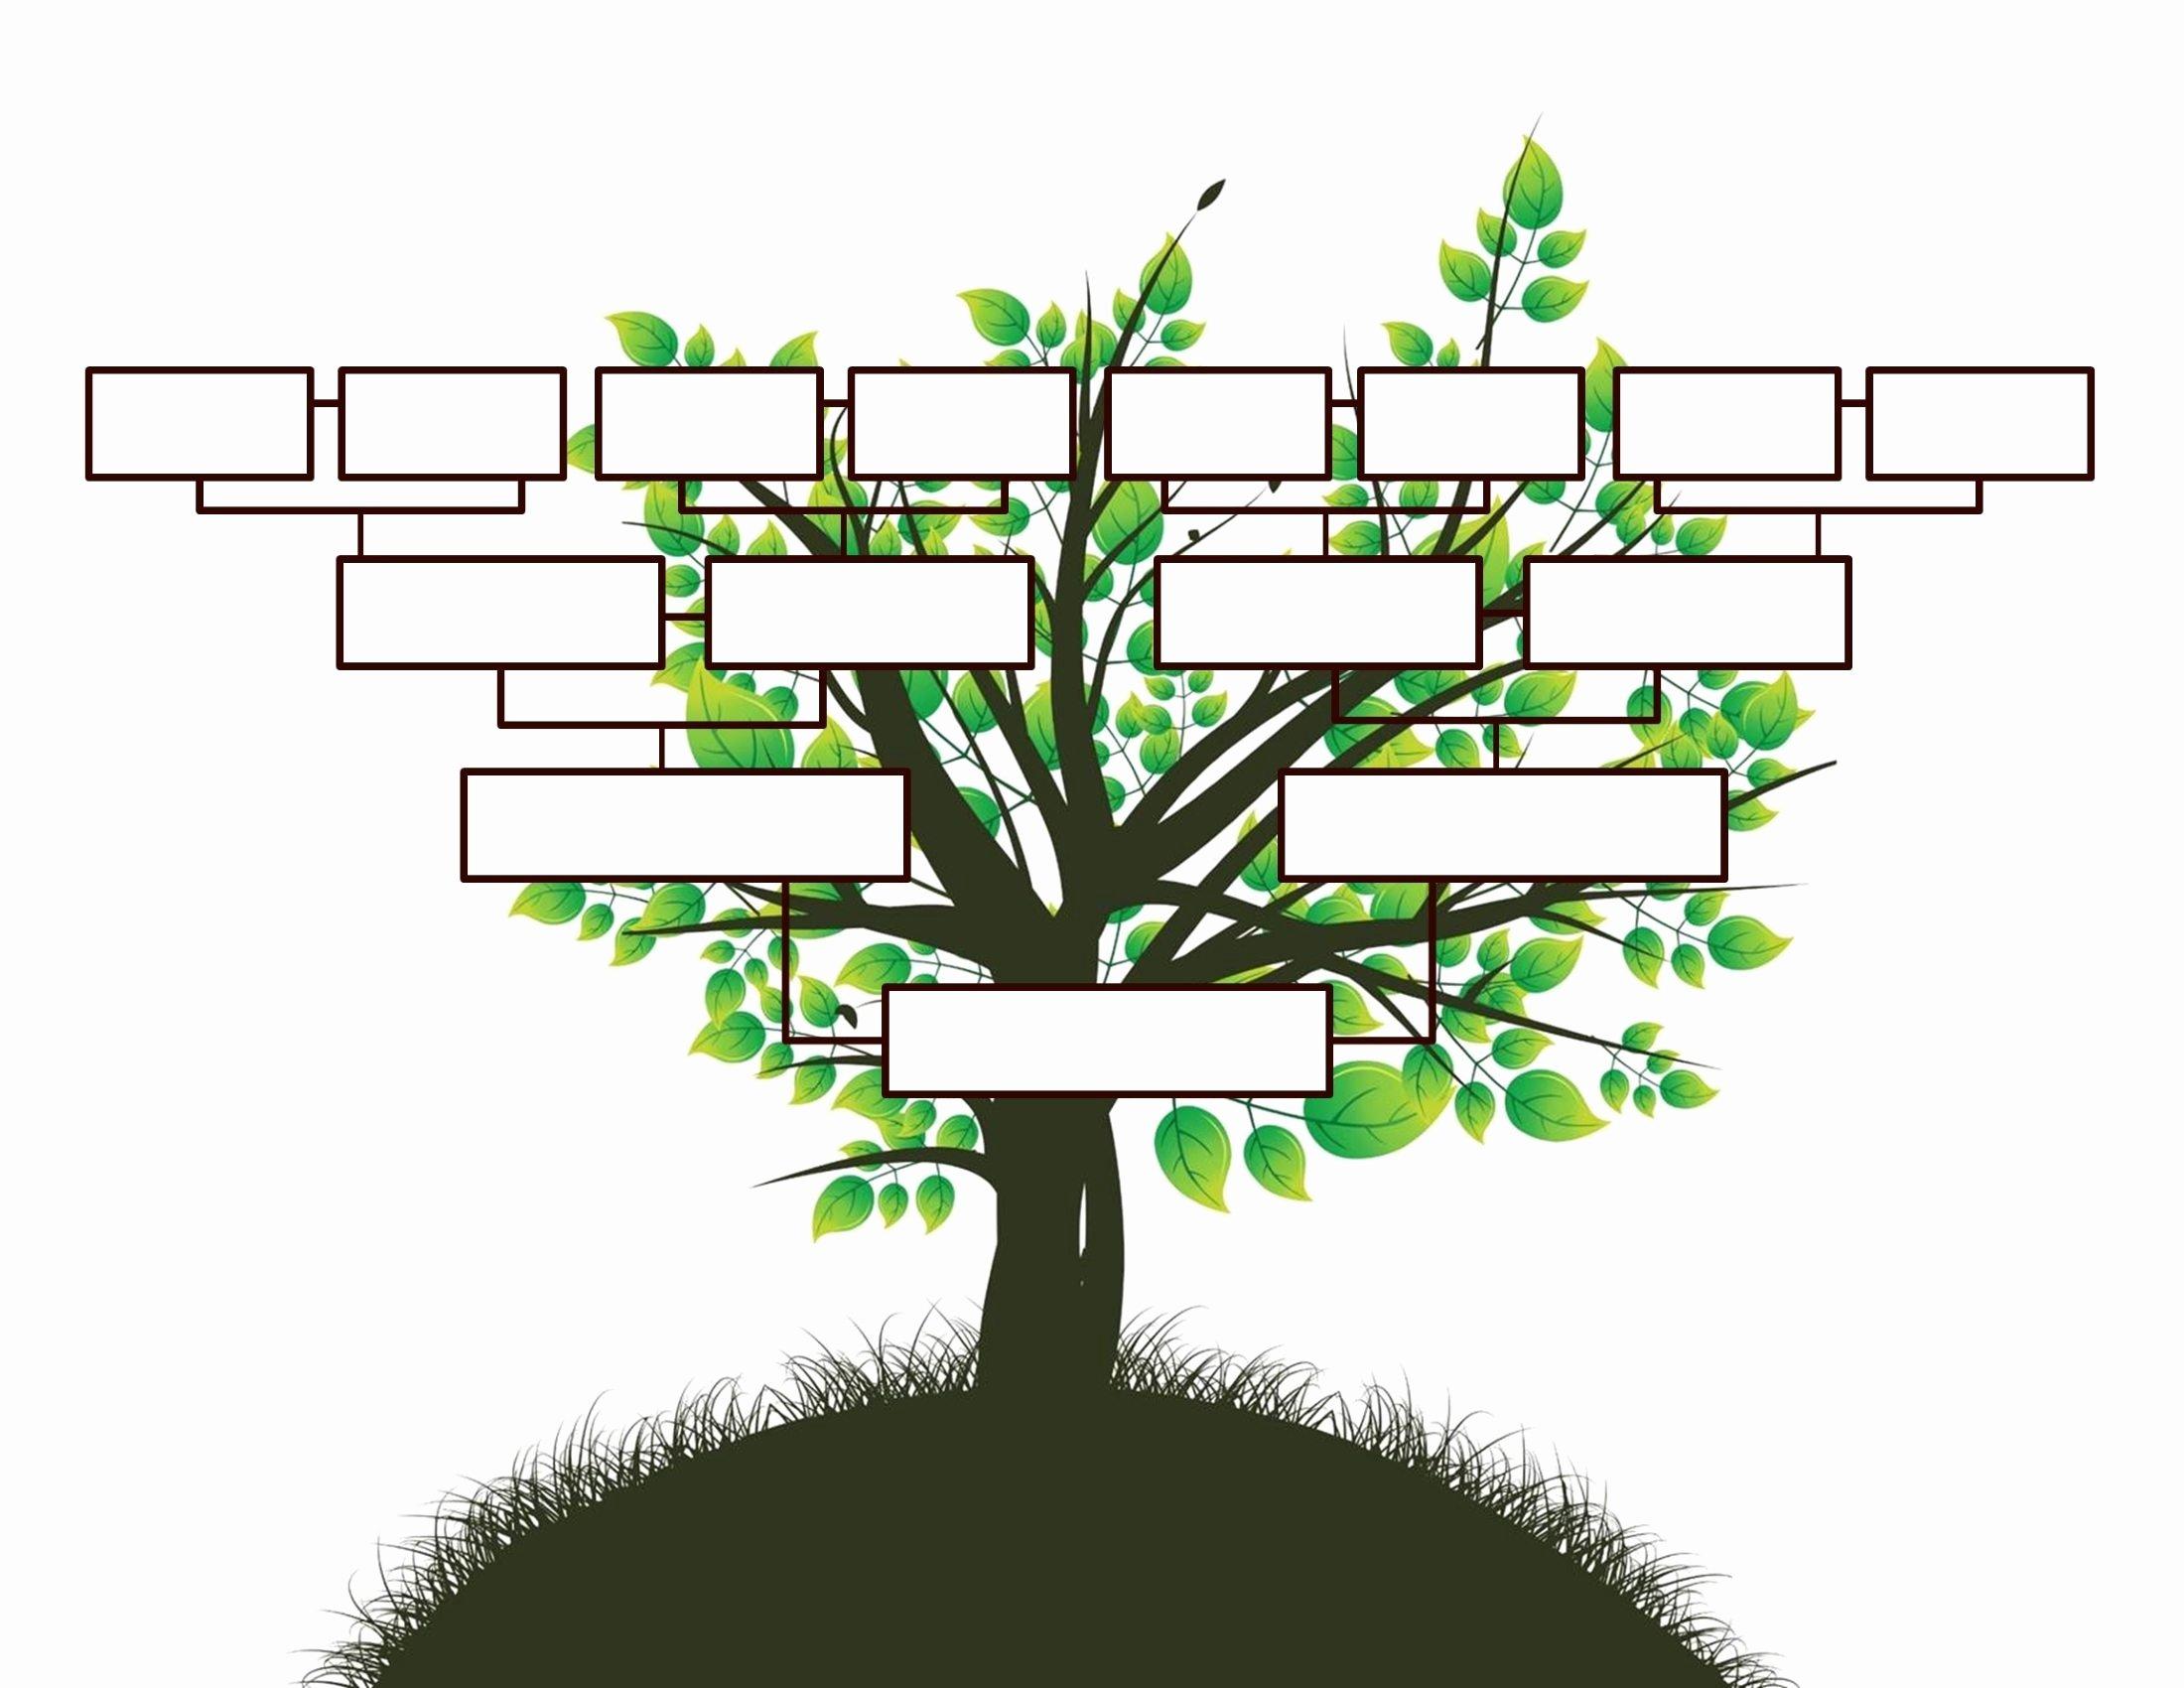 Free Editable Family Tree Template Fresh Free Editable Family Tree Template Daily Roabox